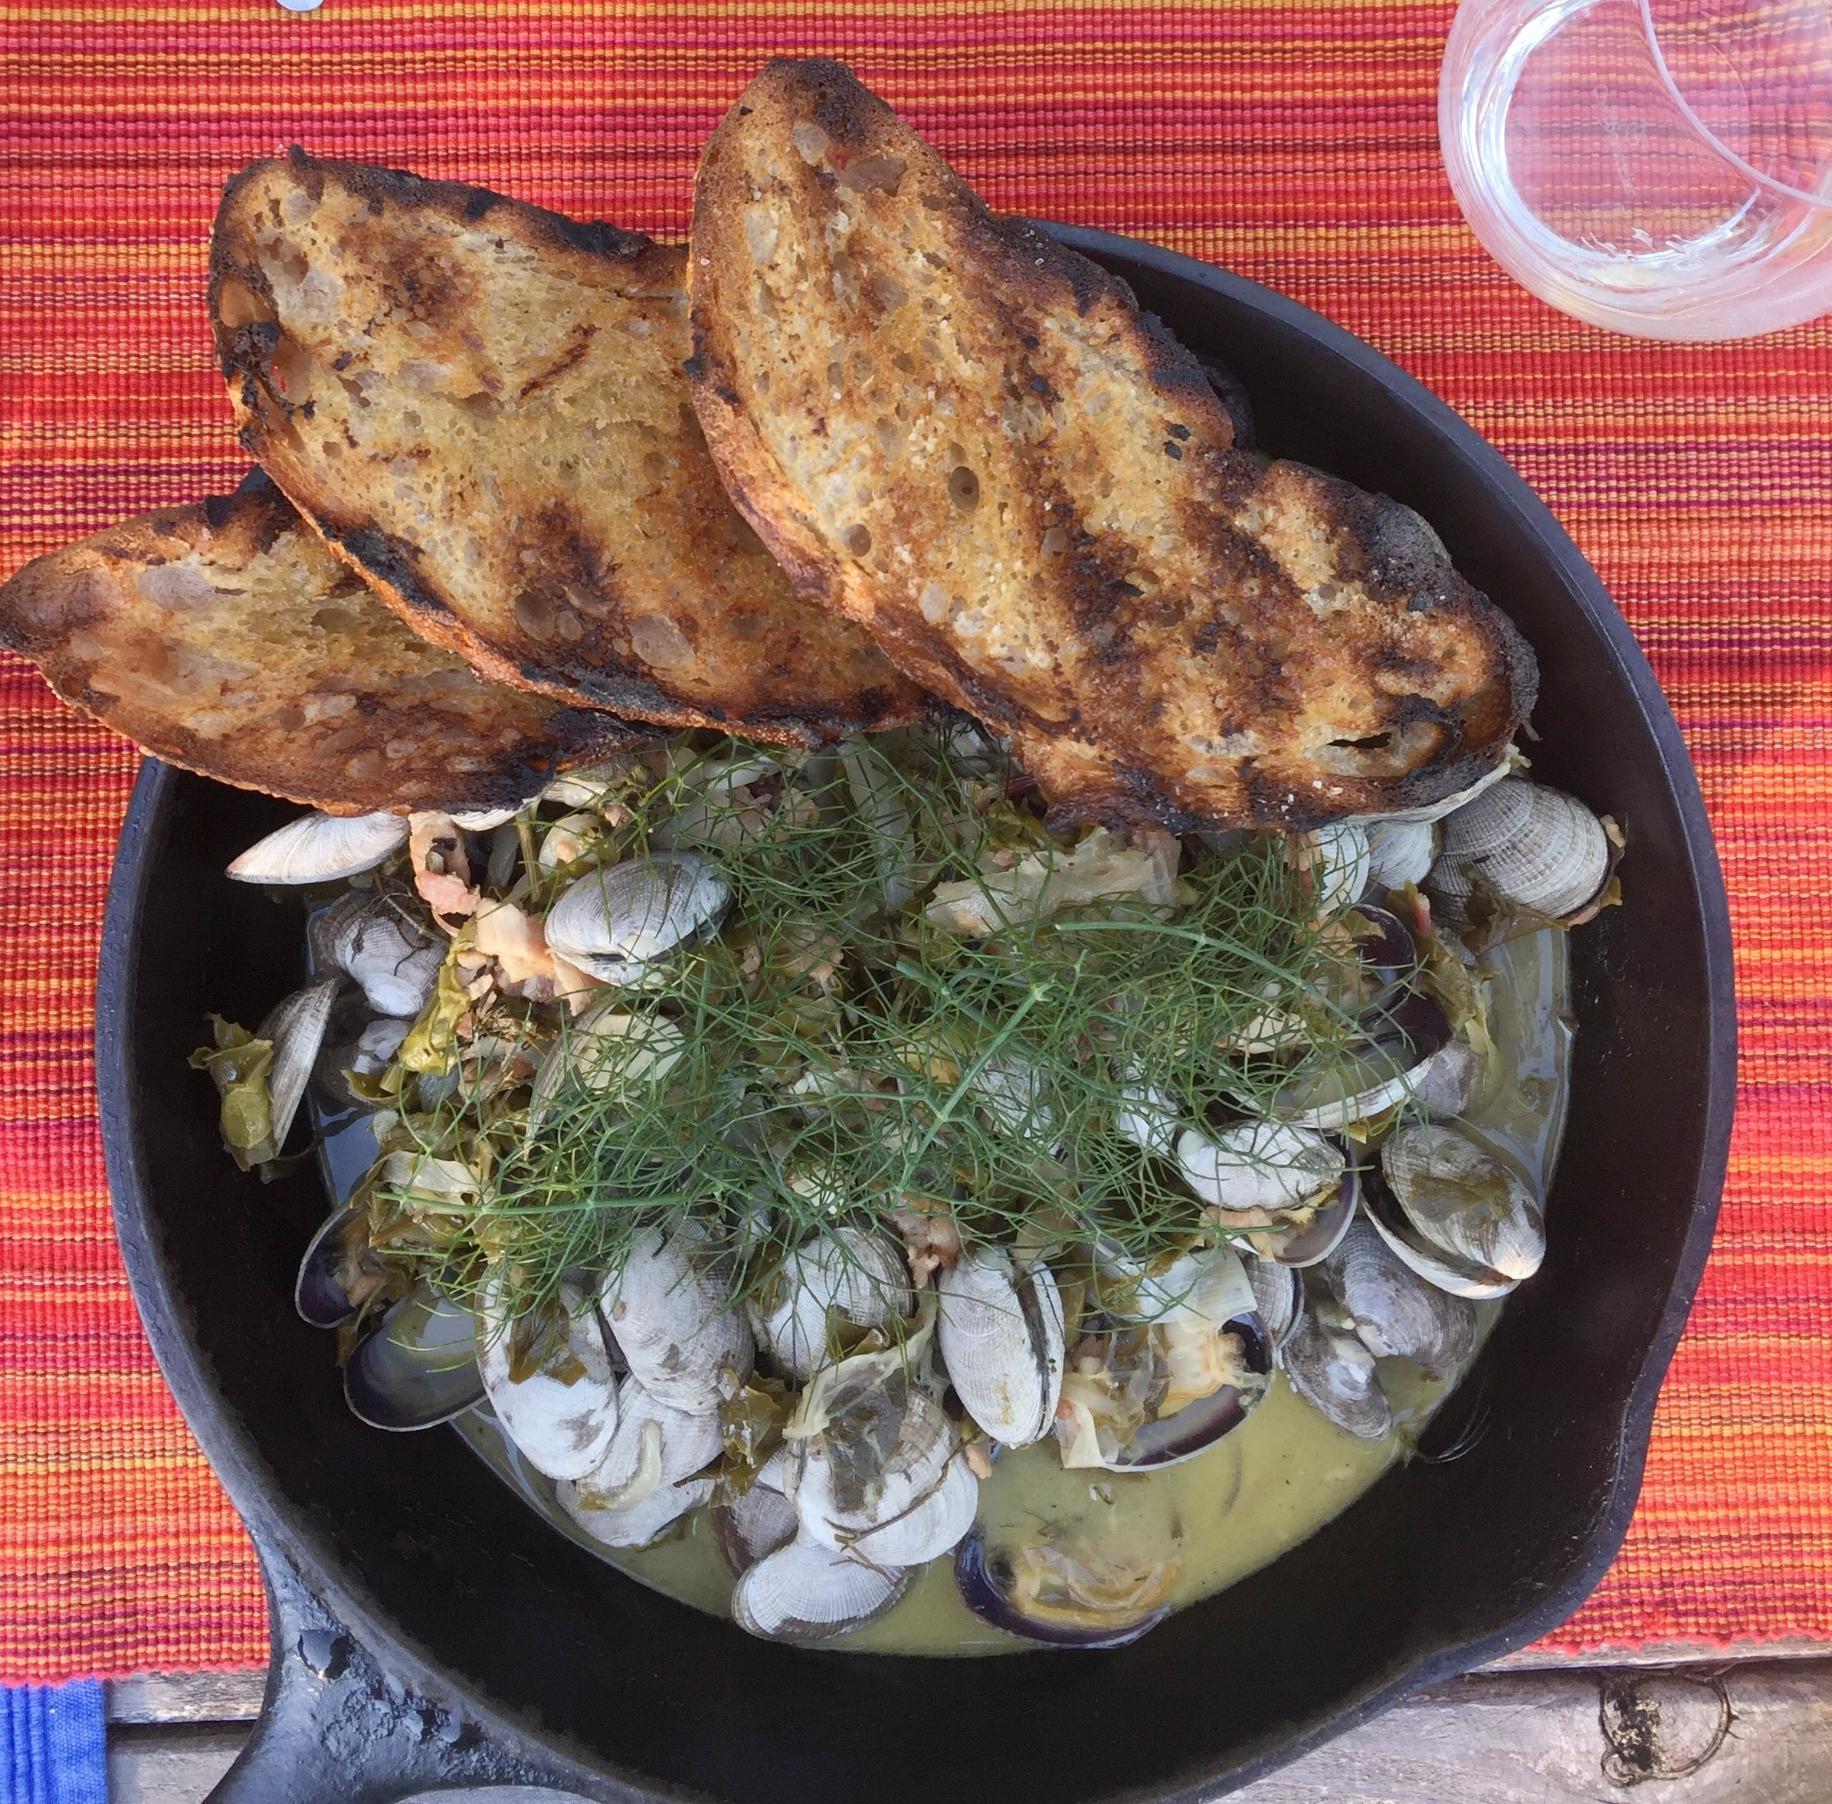 Buck Bay Manilla Clams for dinner tonight al fresco at  Turtlehead Farms